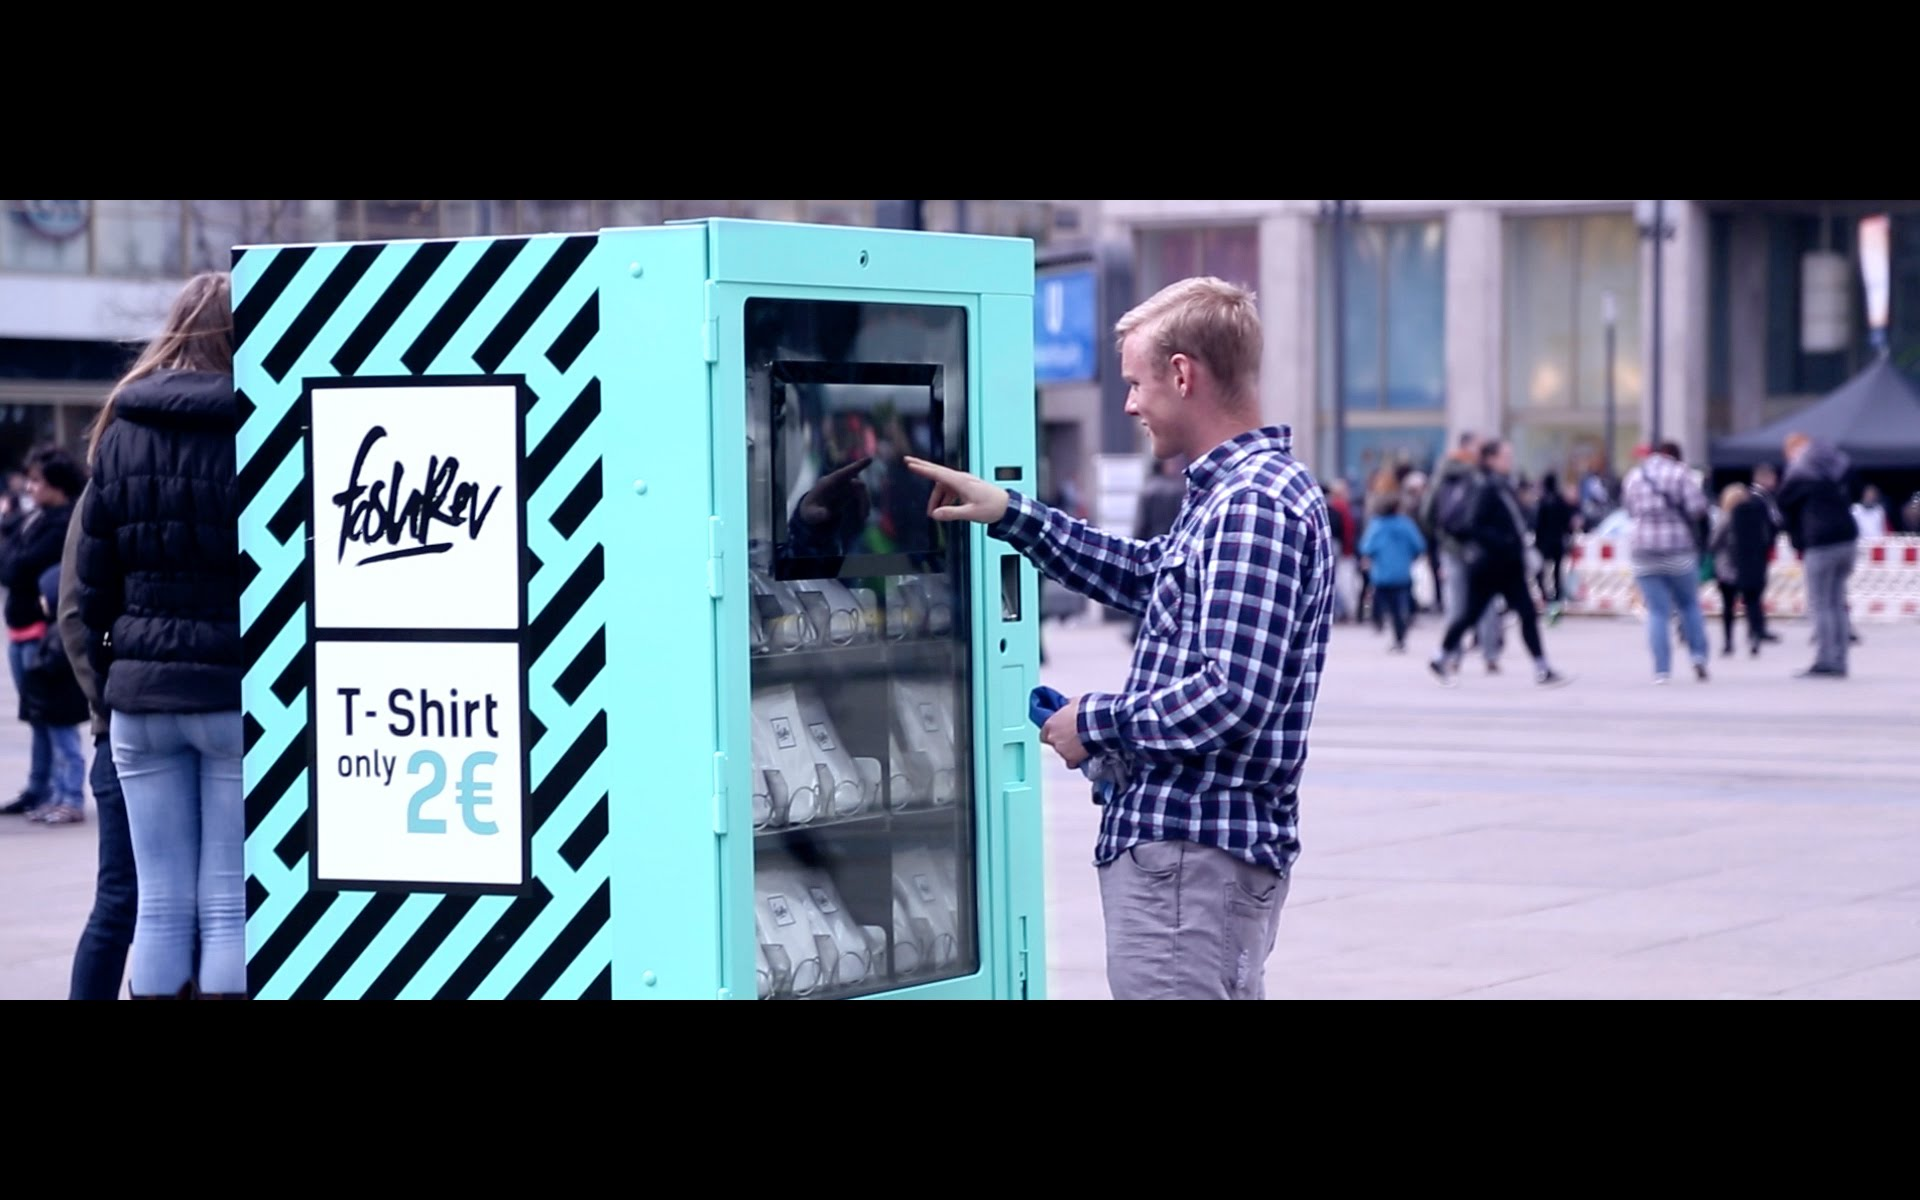 The-2-Euro-T-Shirt-A-Social-Experiment